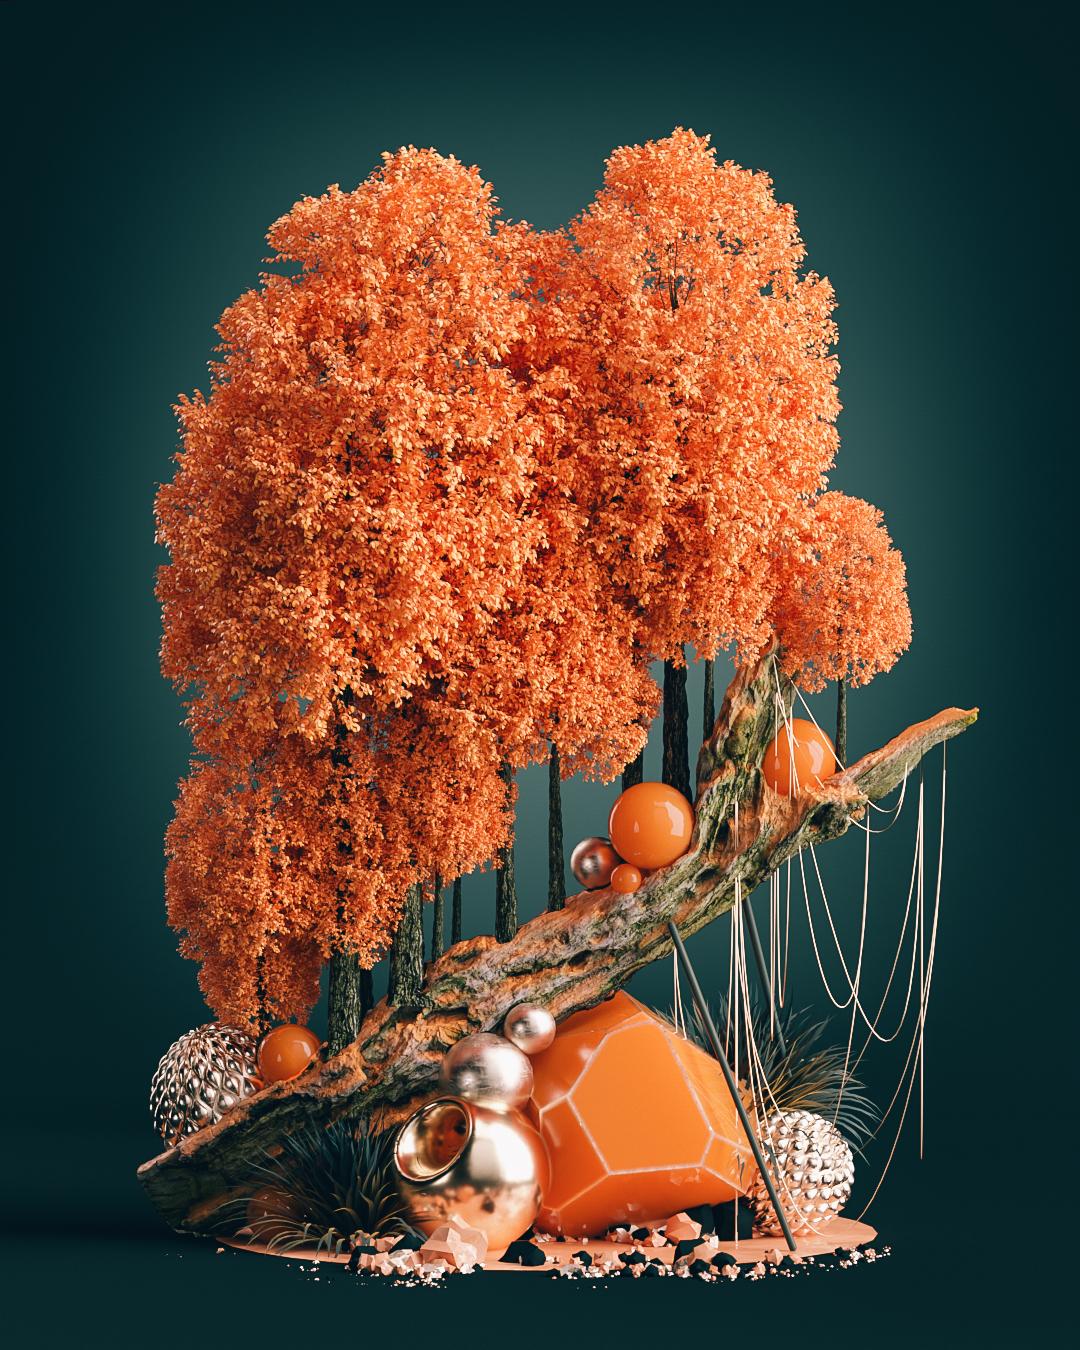 NERD: Nature's Orange - Roman Bratschi